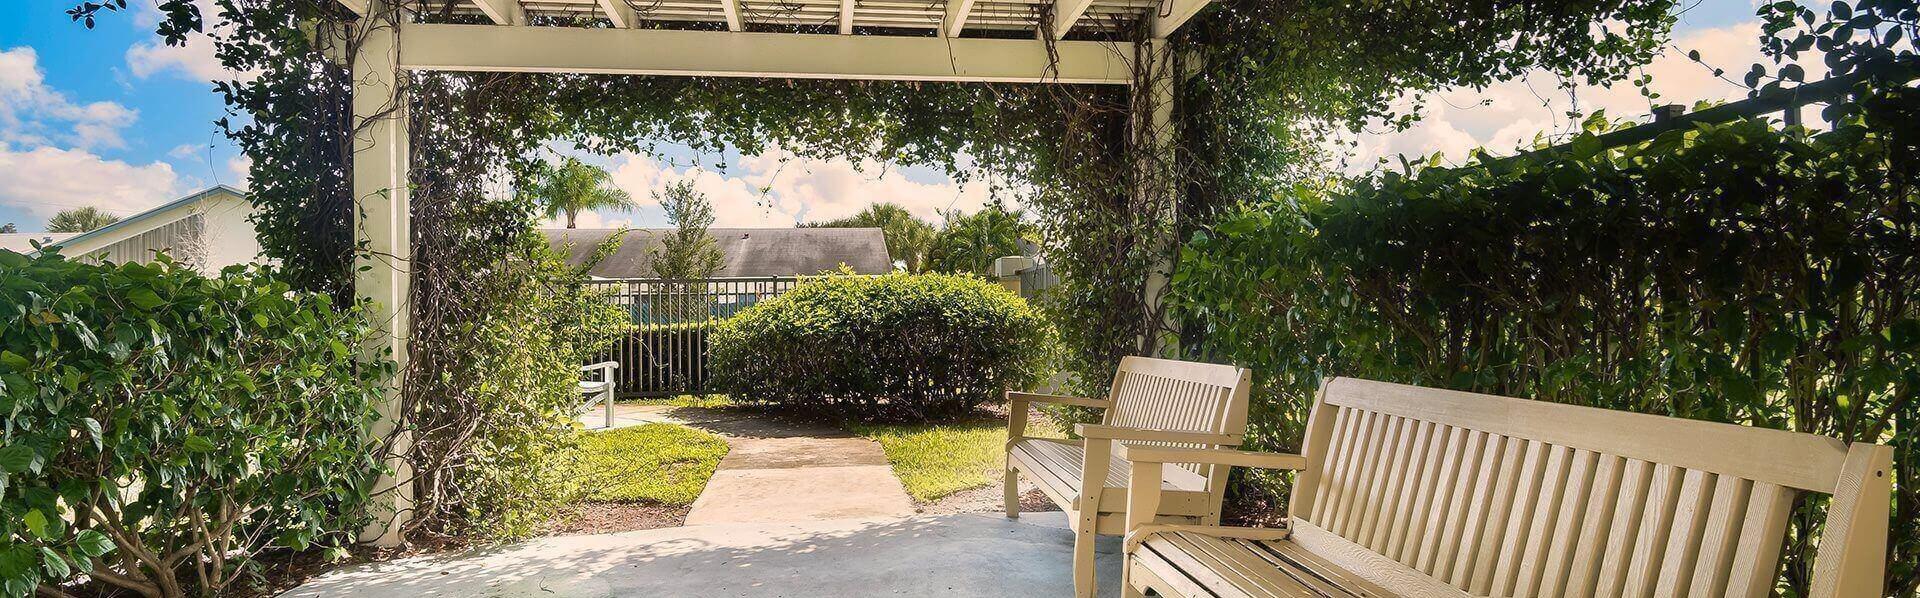 Beautiful Courtyard Sitting Area at Pacifica Senior Living Palm Beach, Greenacres, 33467